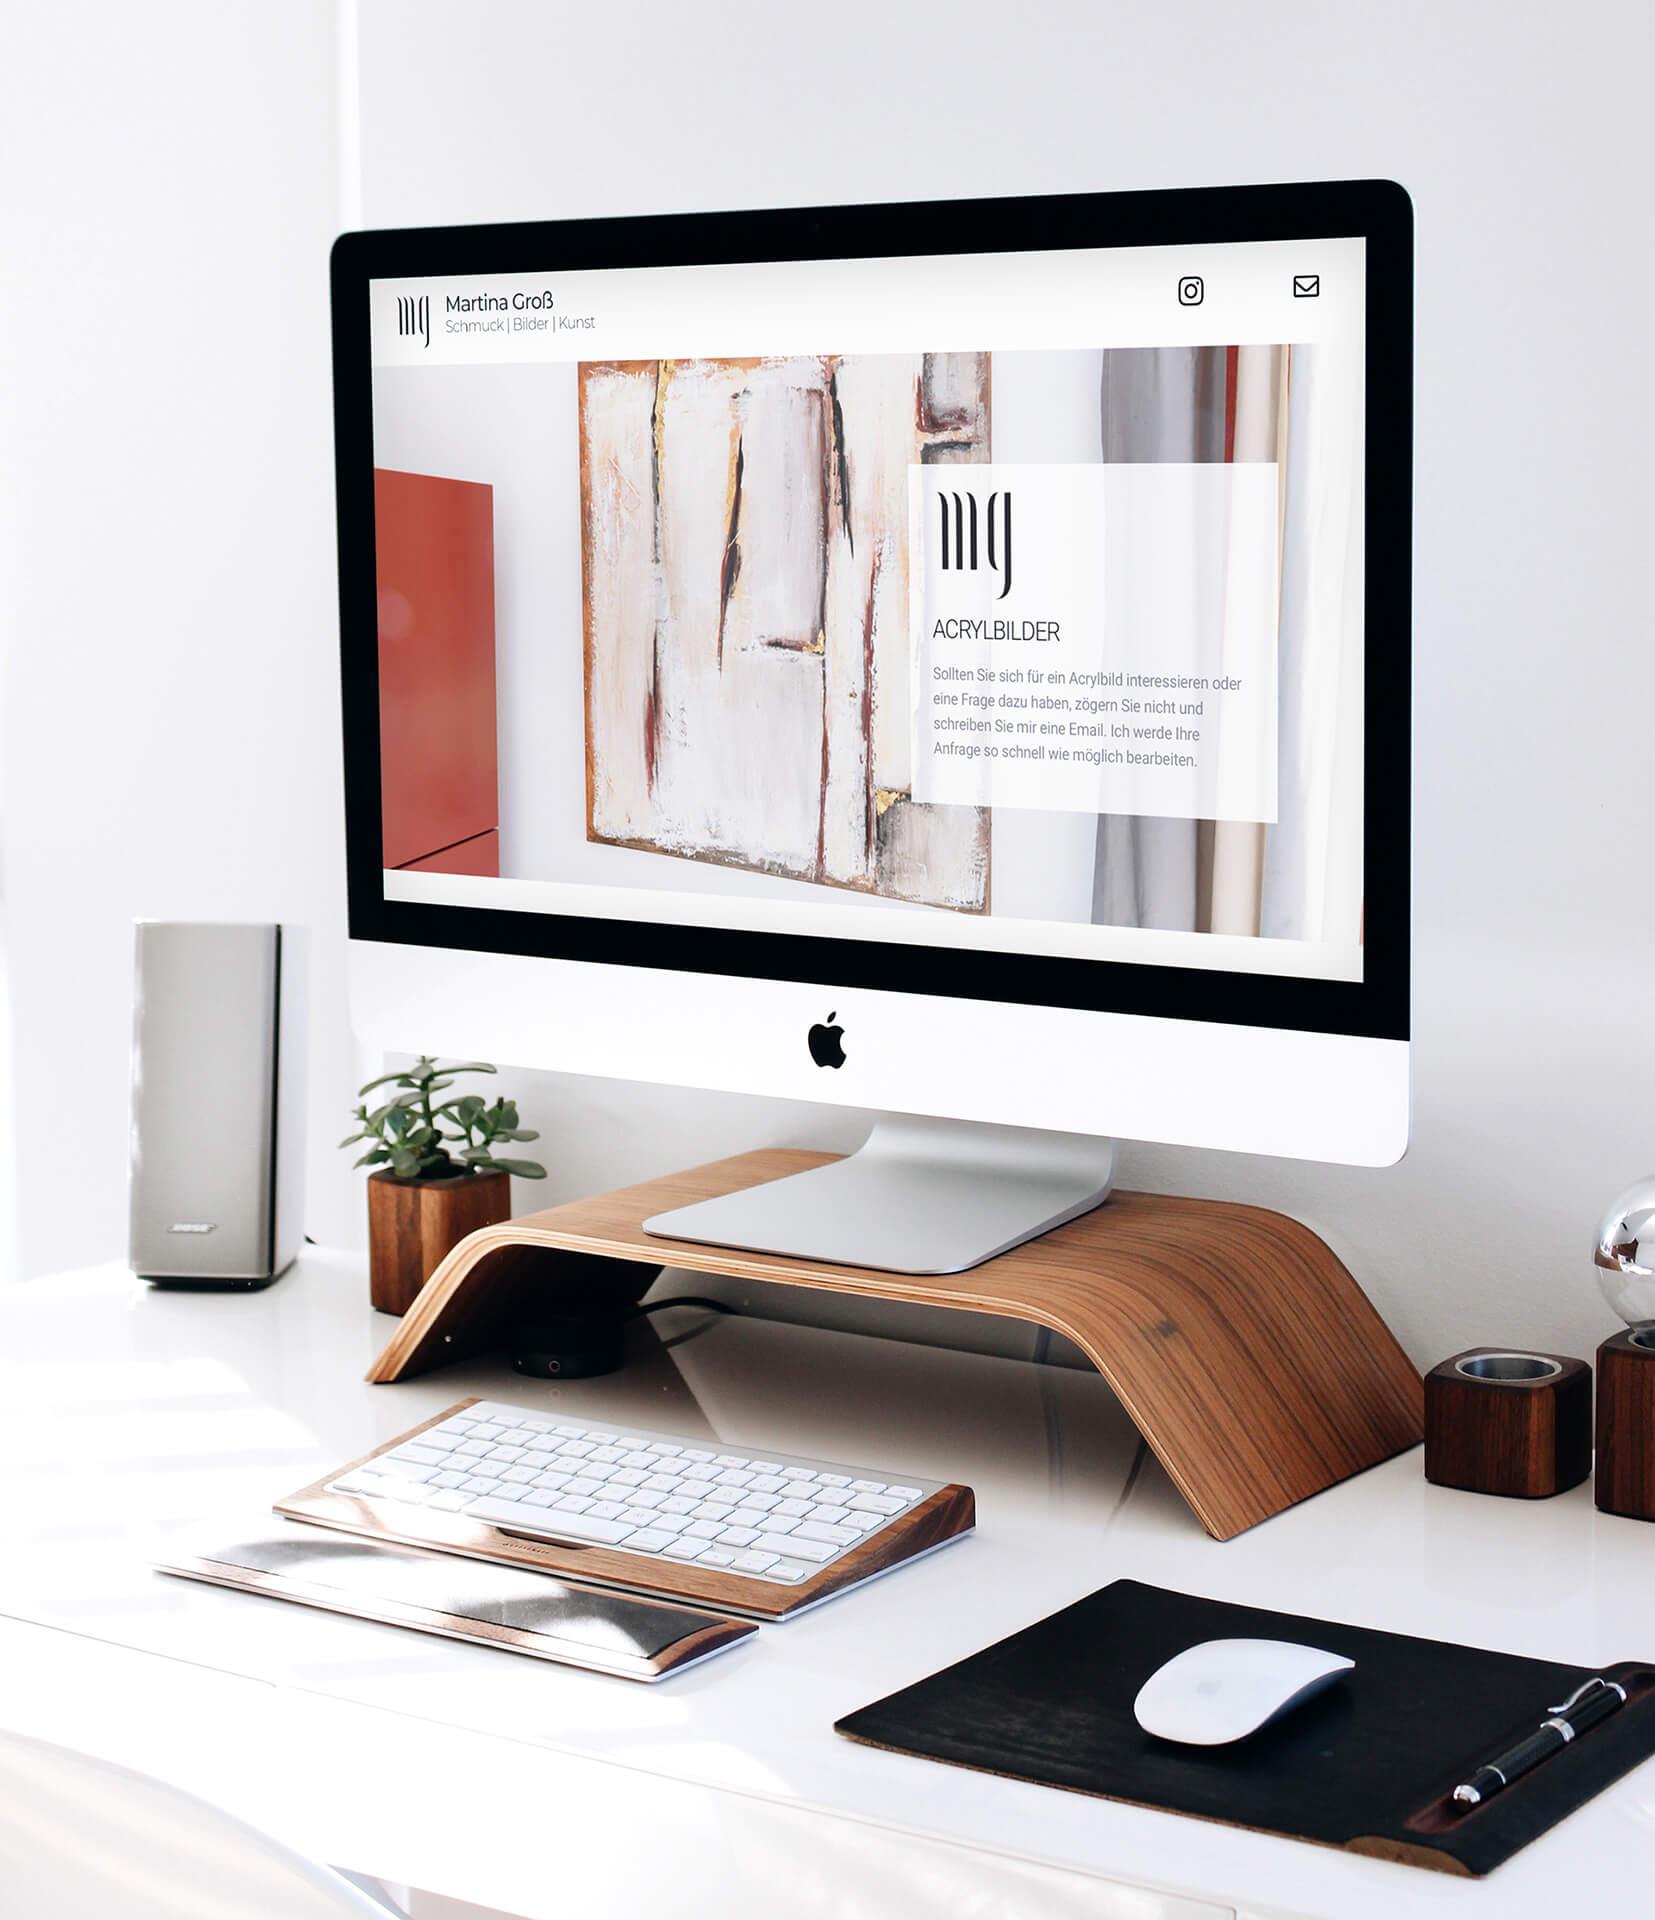 gniced-daniel gross-pfaffenhofen-grafikdesign-digital-webdesign-webentwicklung-8